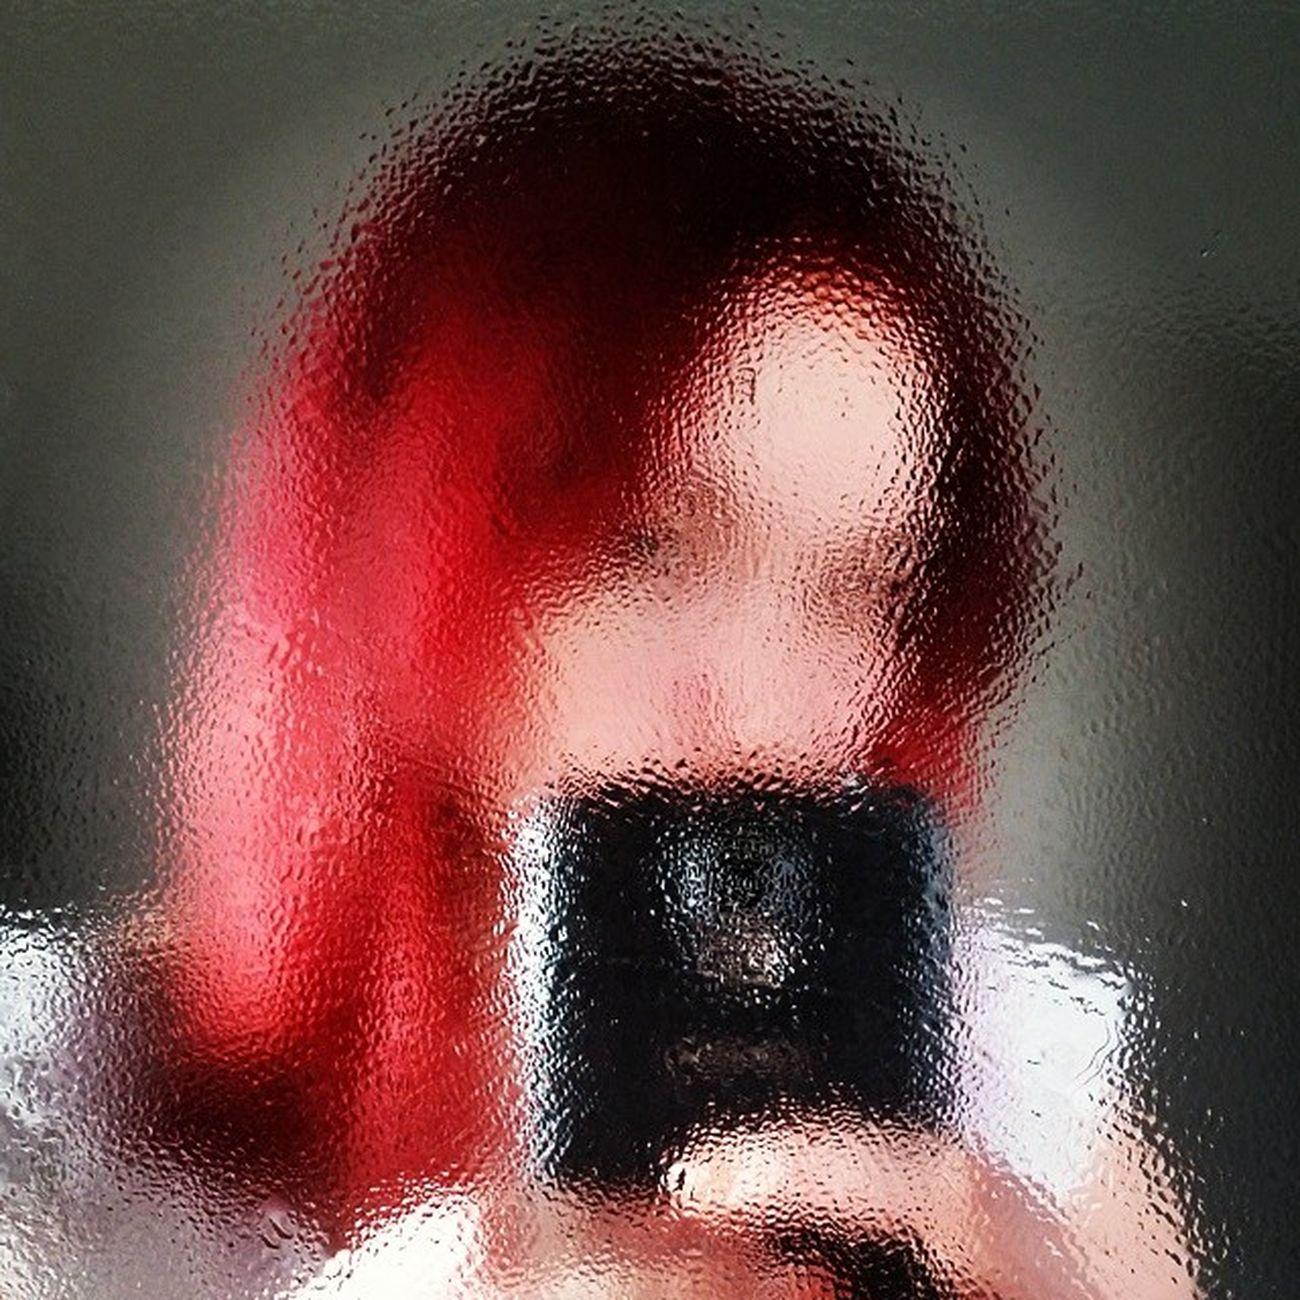 Sneakpeak Rainy Raindrops Redhead Ilrgirls Droplets Steamy Redheadproblems Samsung Galaxy